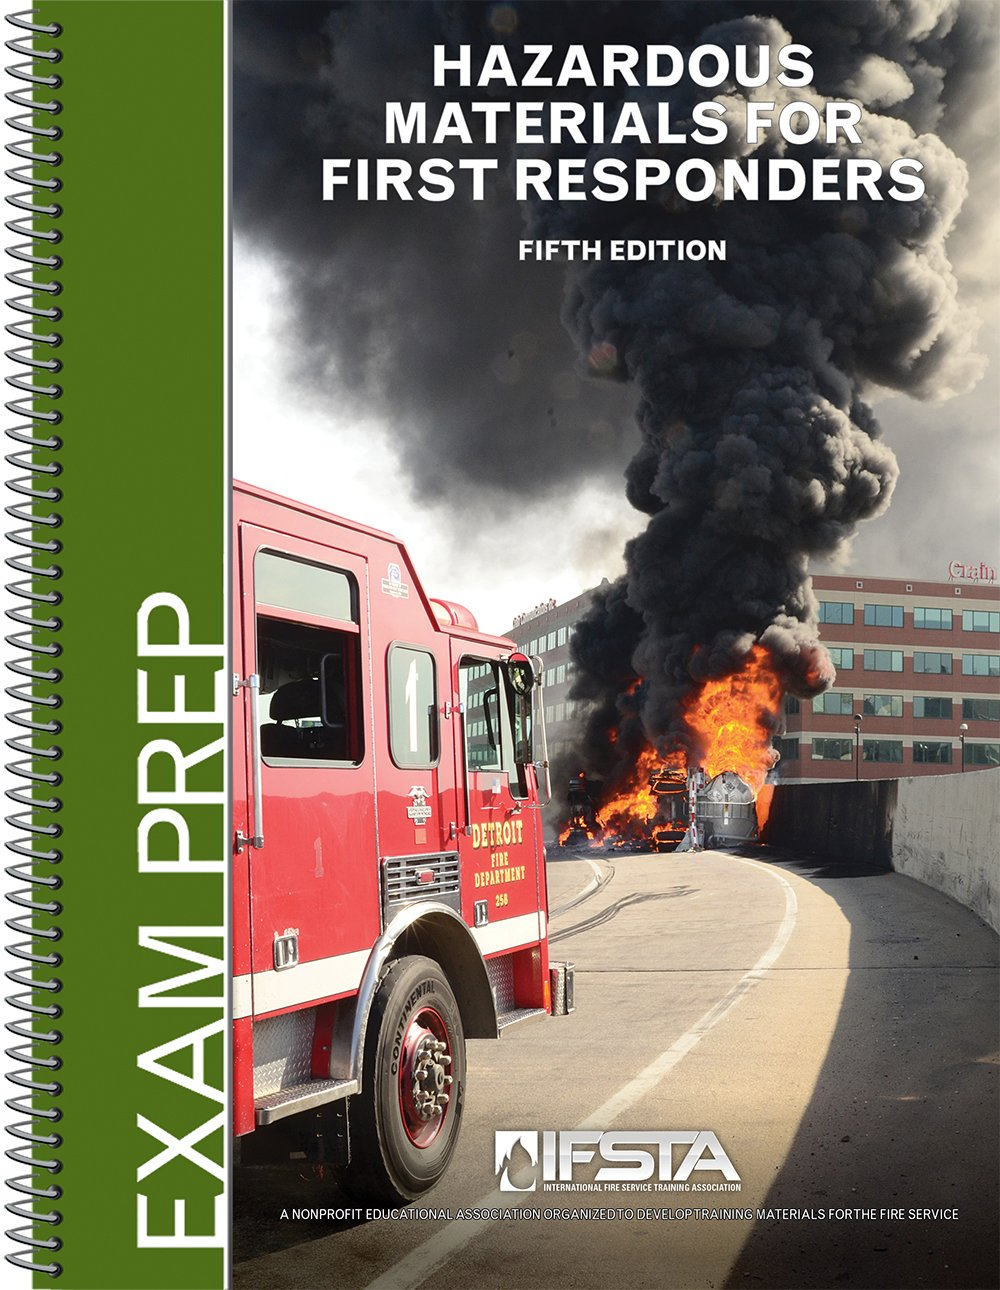 Hazardous Materials for First Responders 5th Edition Exam Prep:  International Fire Service Training Asscoaitation: 9780879396145:  Amazon.com: Books